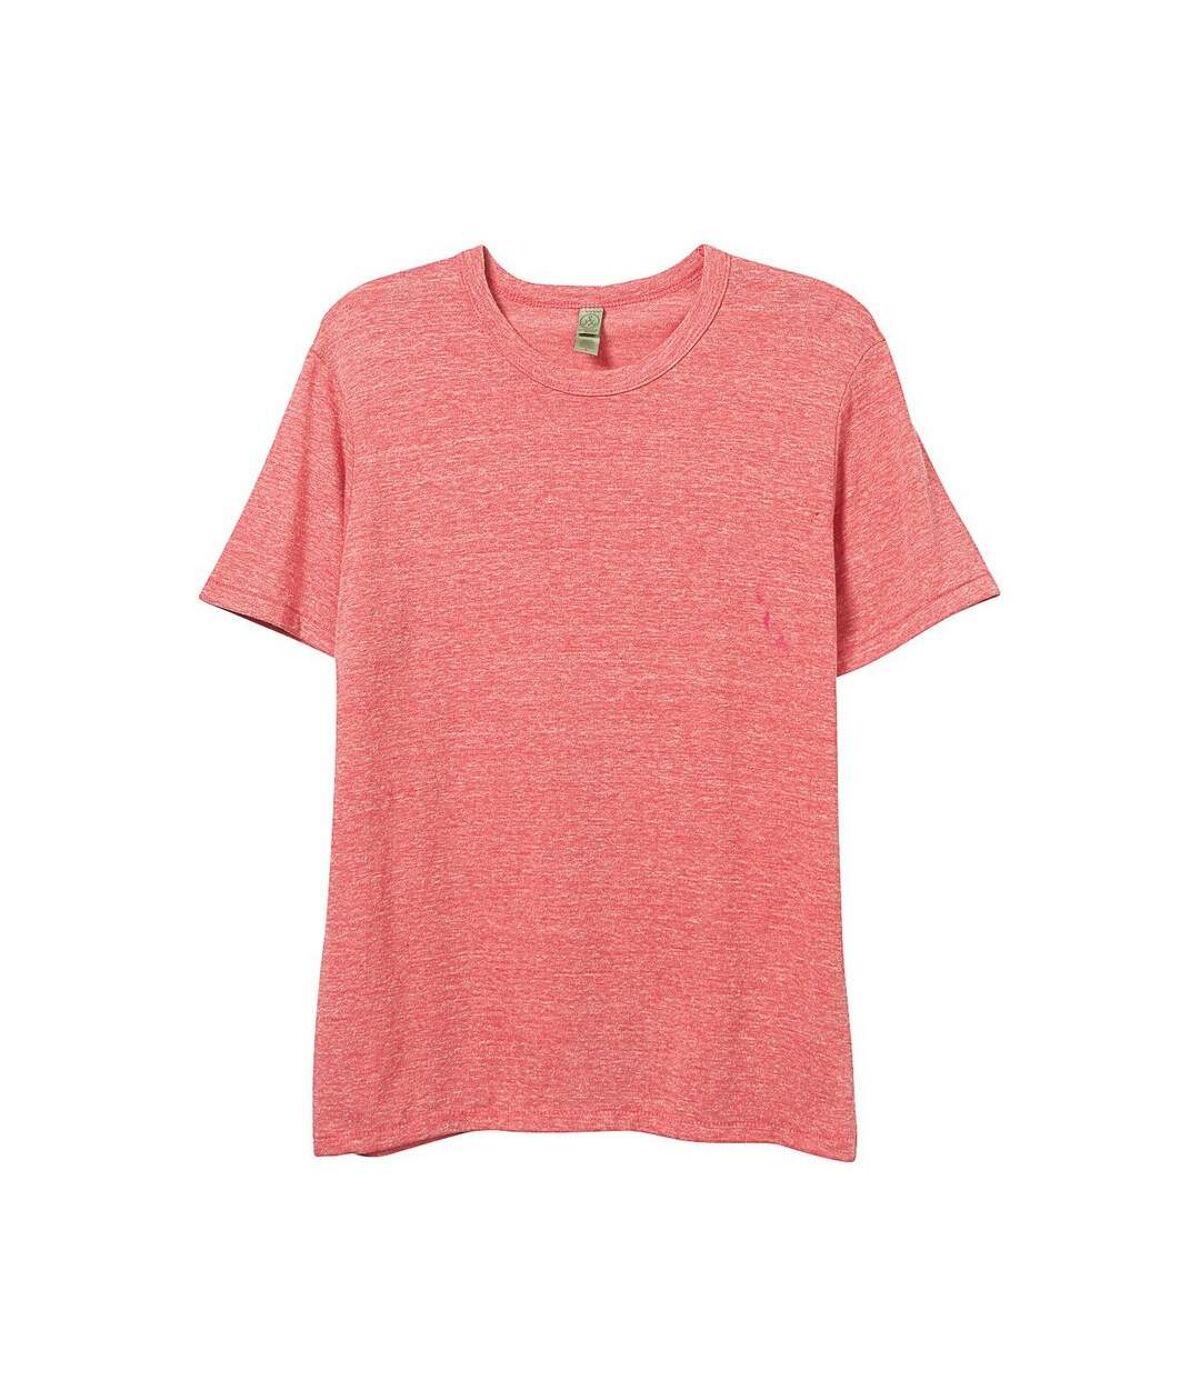 Alternative Apparel Mens Eco Jersey Crew T-shirt (Eco Red) - UTRW6004